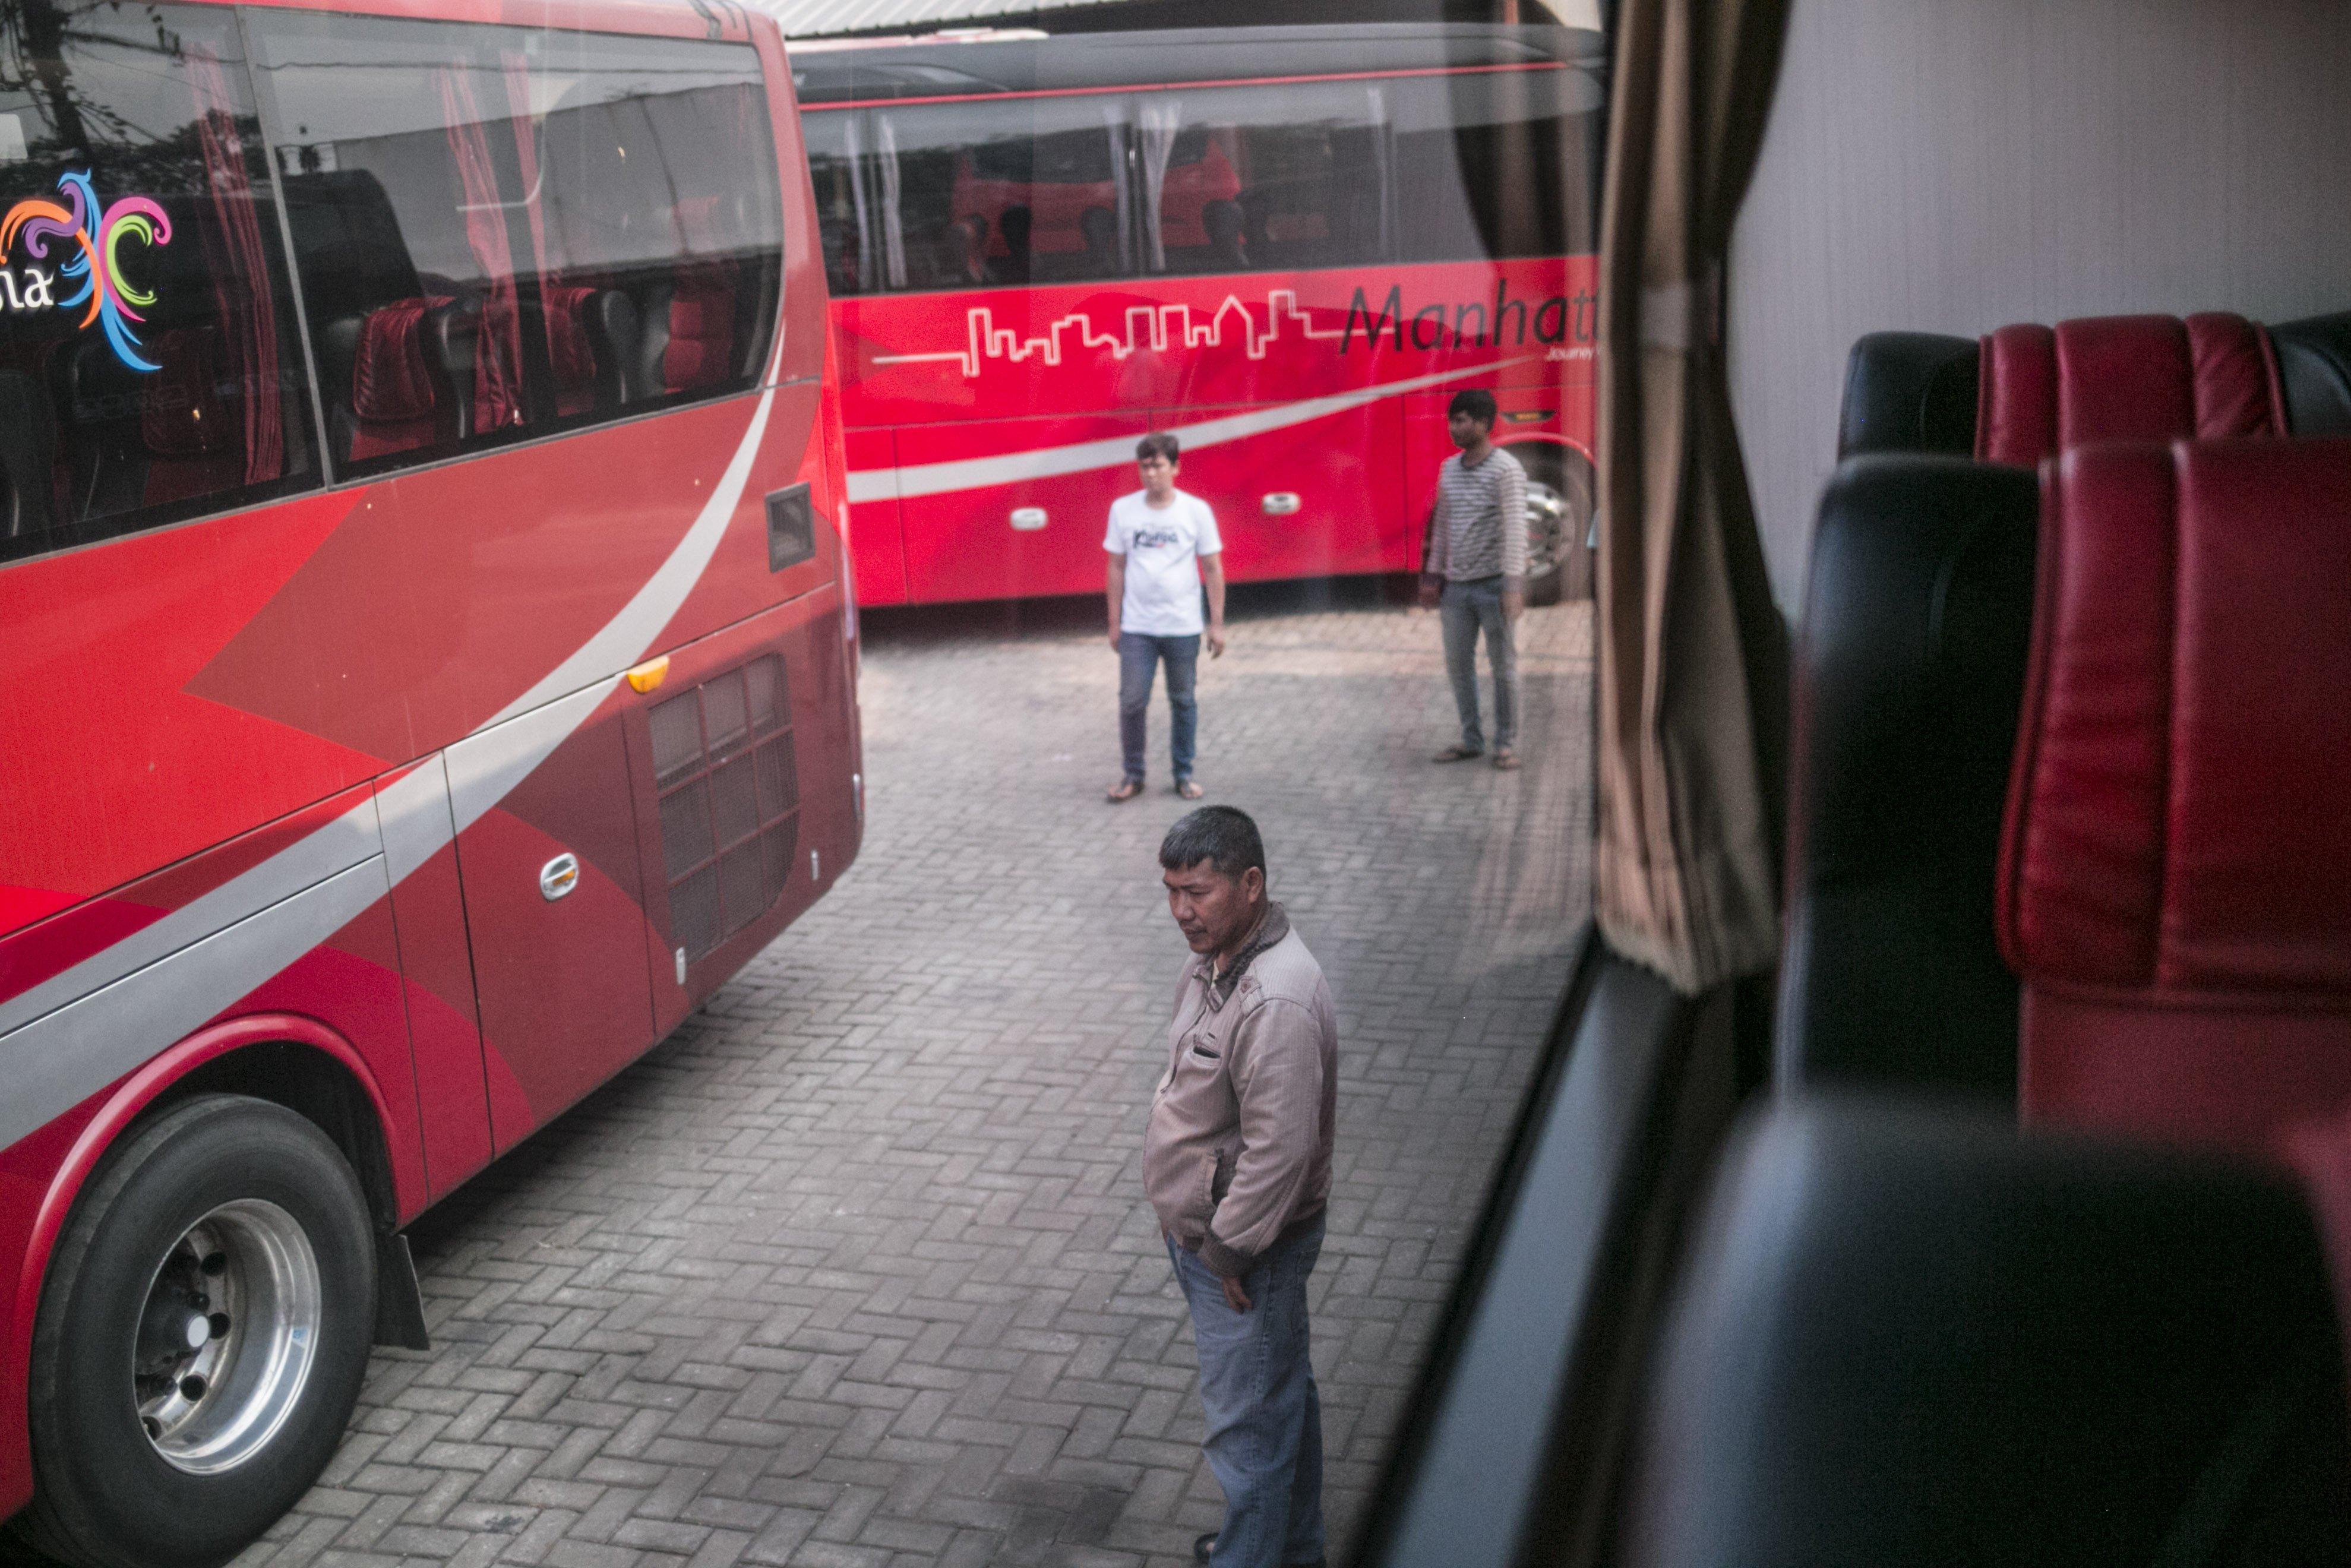 Potret para driver bus di salah satu pool bus pariwisata di kawasan Tanjung Barat, Jagakarsa, Jakarta, Selasa (28/7/2020). Masih diberlakukannya Pembatasan Sosial Bersekala Besar (PSBB) dan penutupan tempat rekreasi akibat Covid-19, berimbas pada jasa transportasi pariwisata. Sejak bulan Maret pengelola mengaku mengalami penurunan pendapatan dan penyewaan bus hingga 80%.